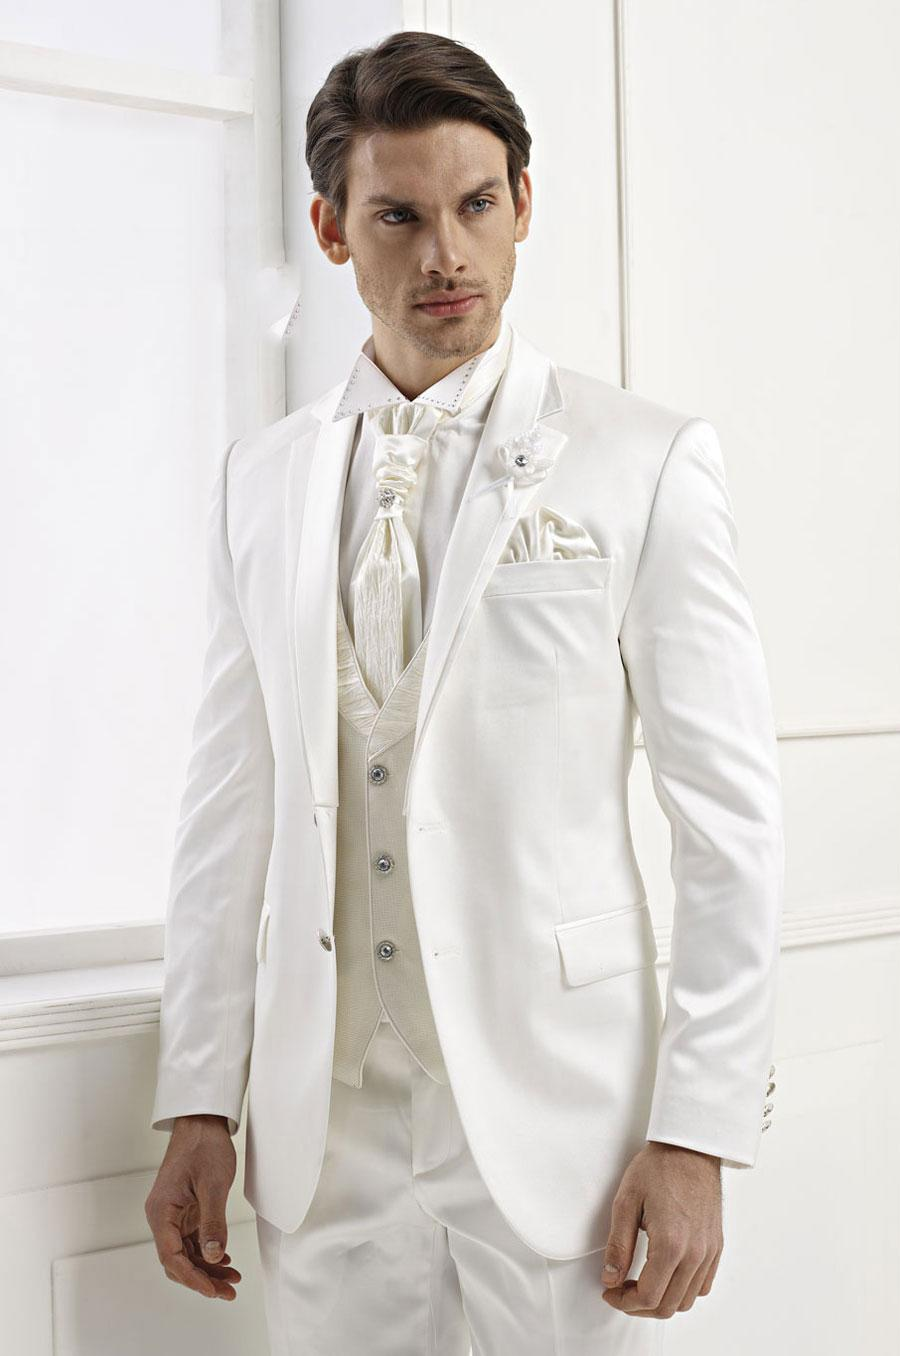 White Wedding Suits For Men Shawl Lapel Groom Tuxedos Groomsmen ...